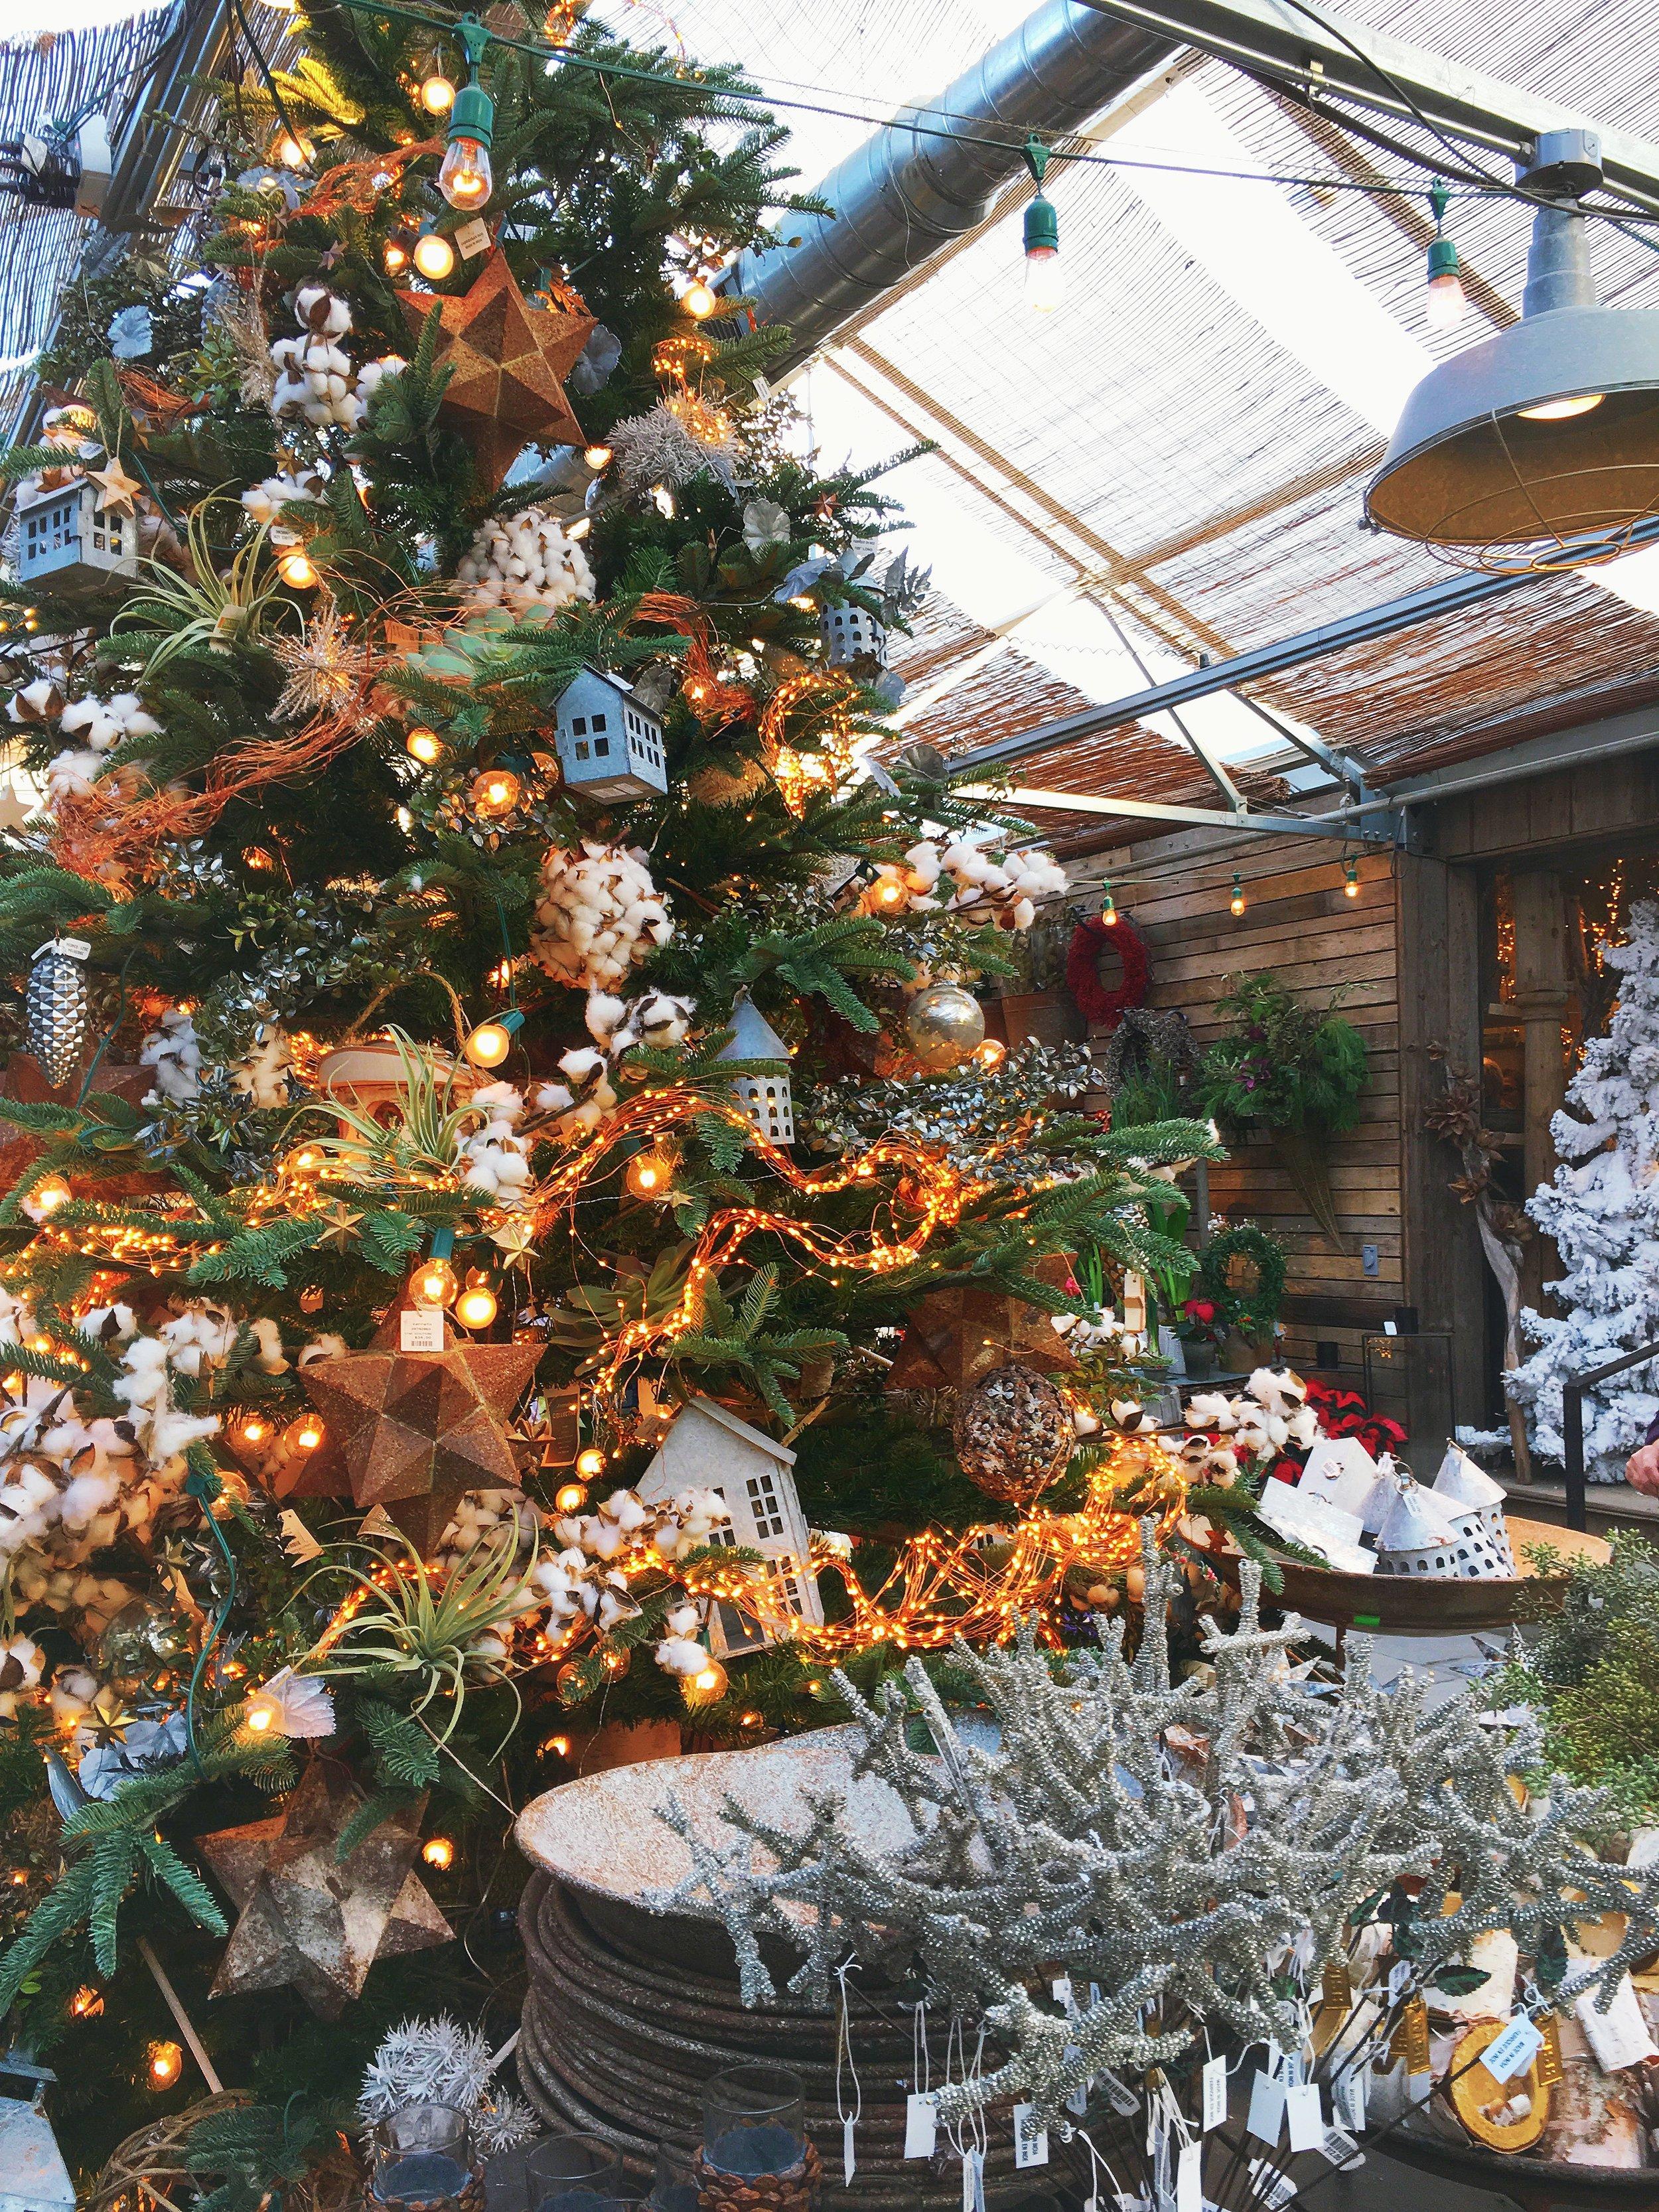 Terrain Christmas Tree via Unusually Lovely